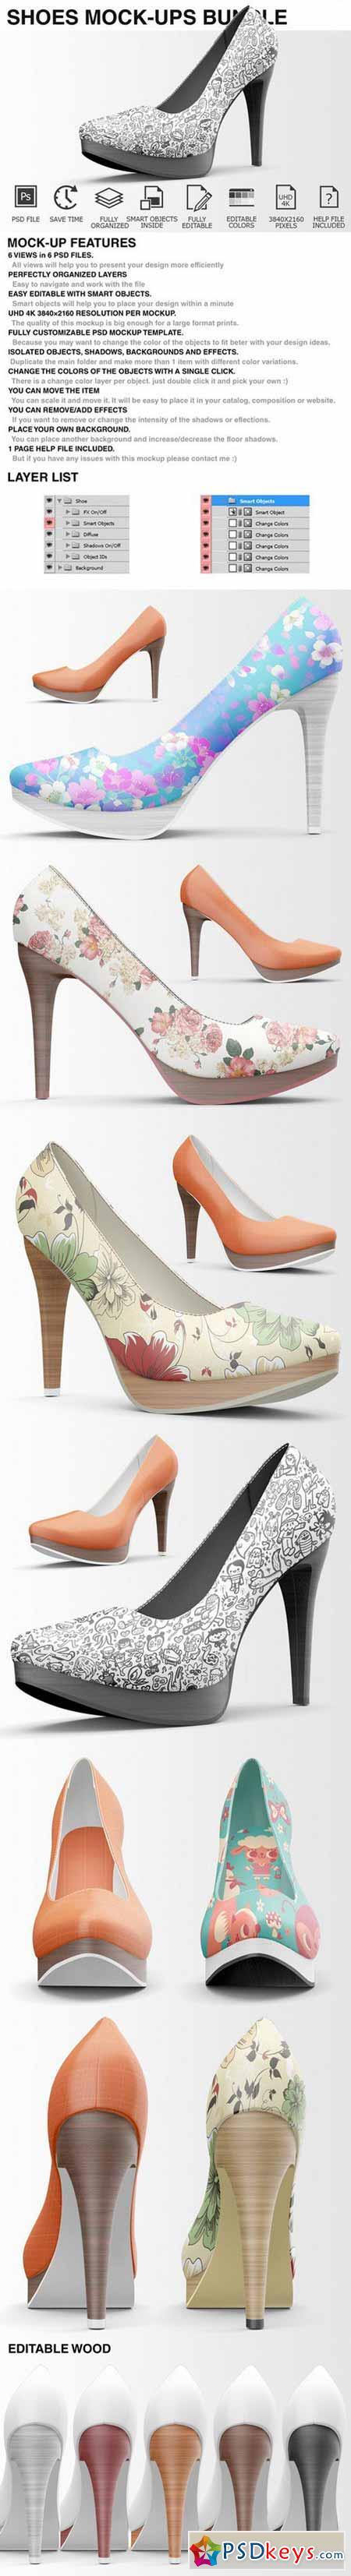 High Heels Shoes Mockup Bundle 401875